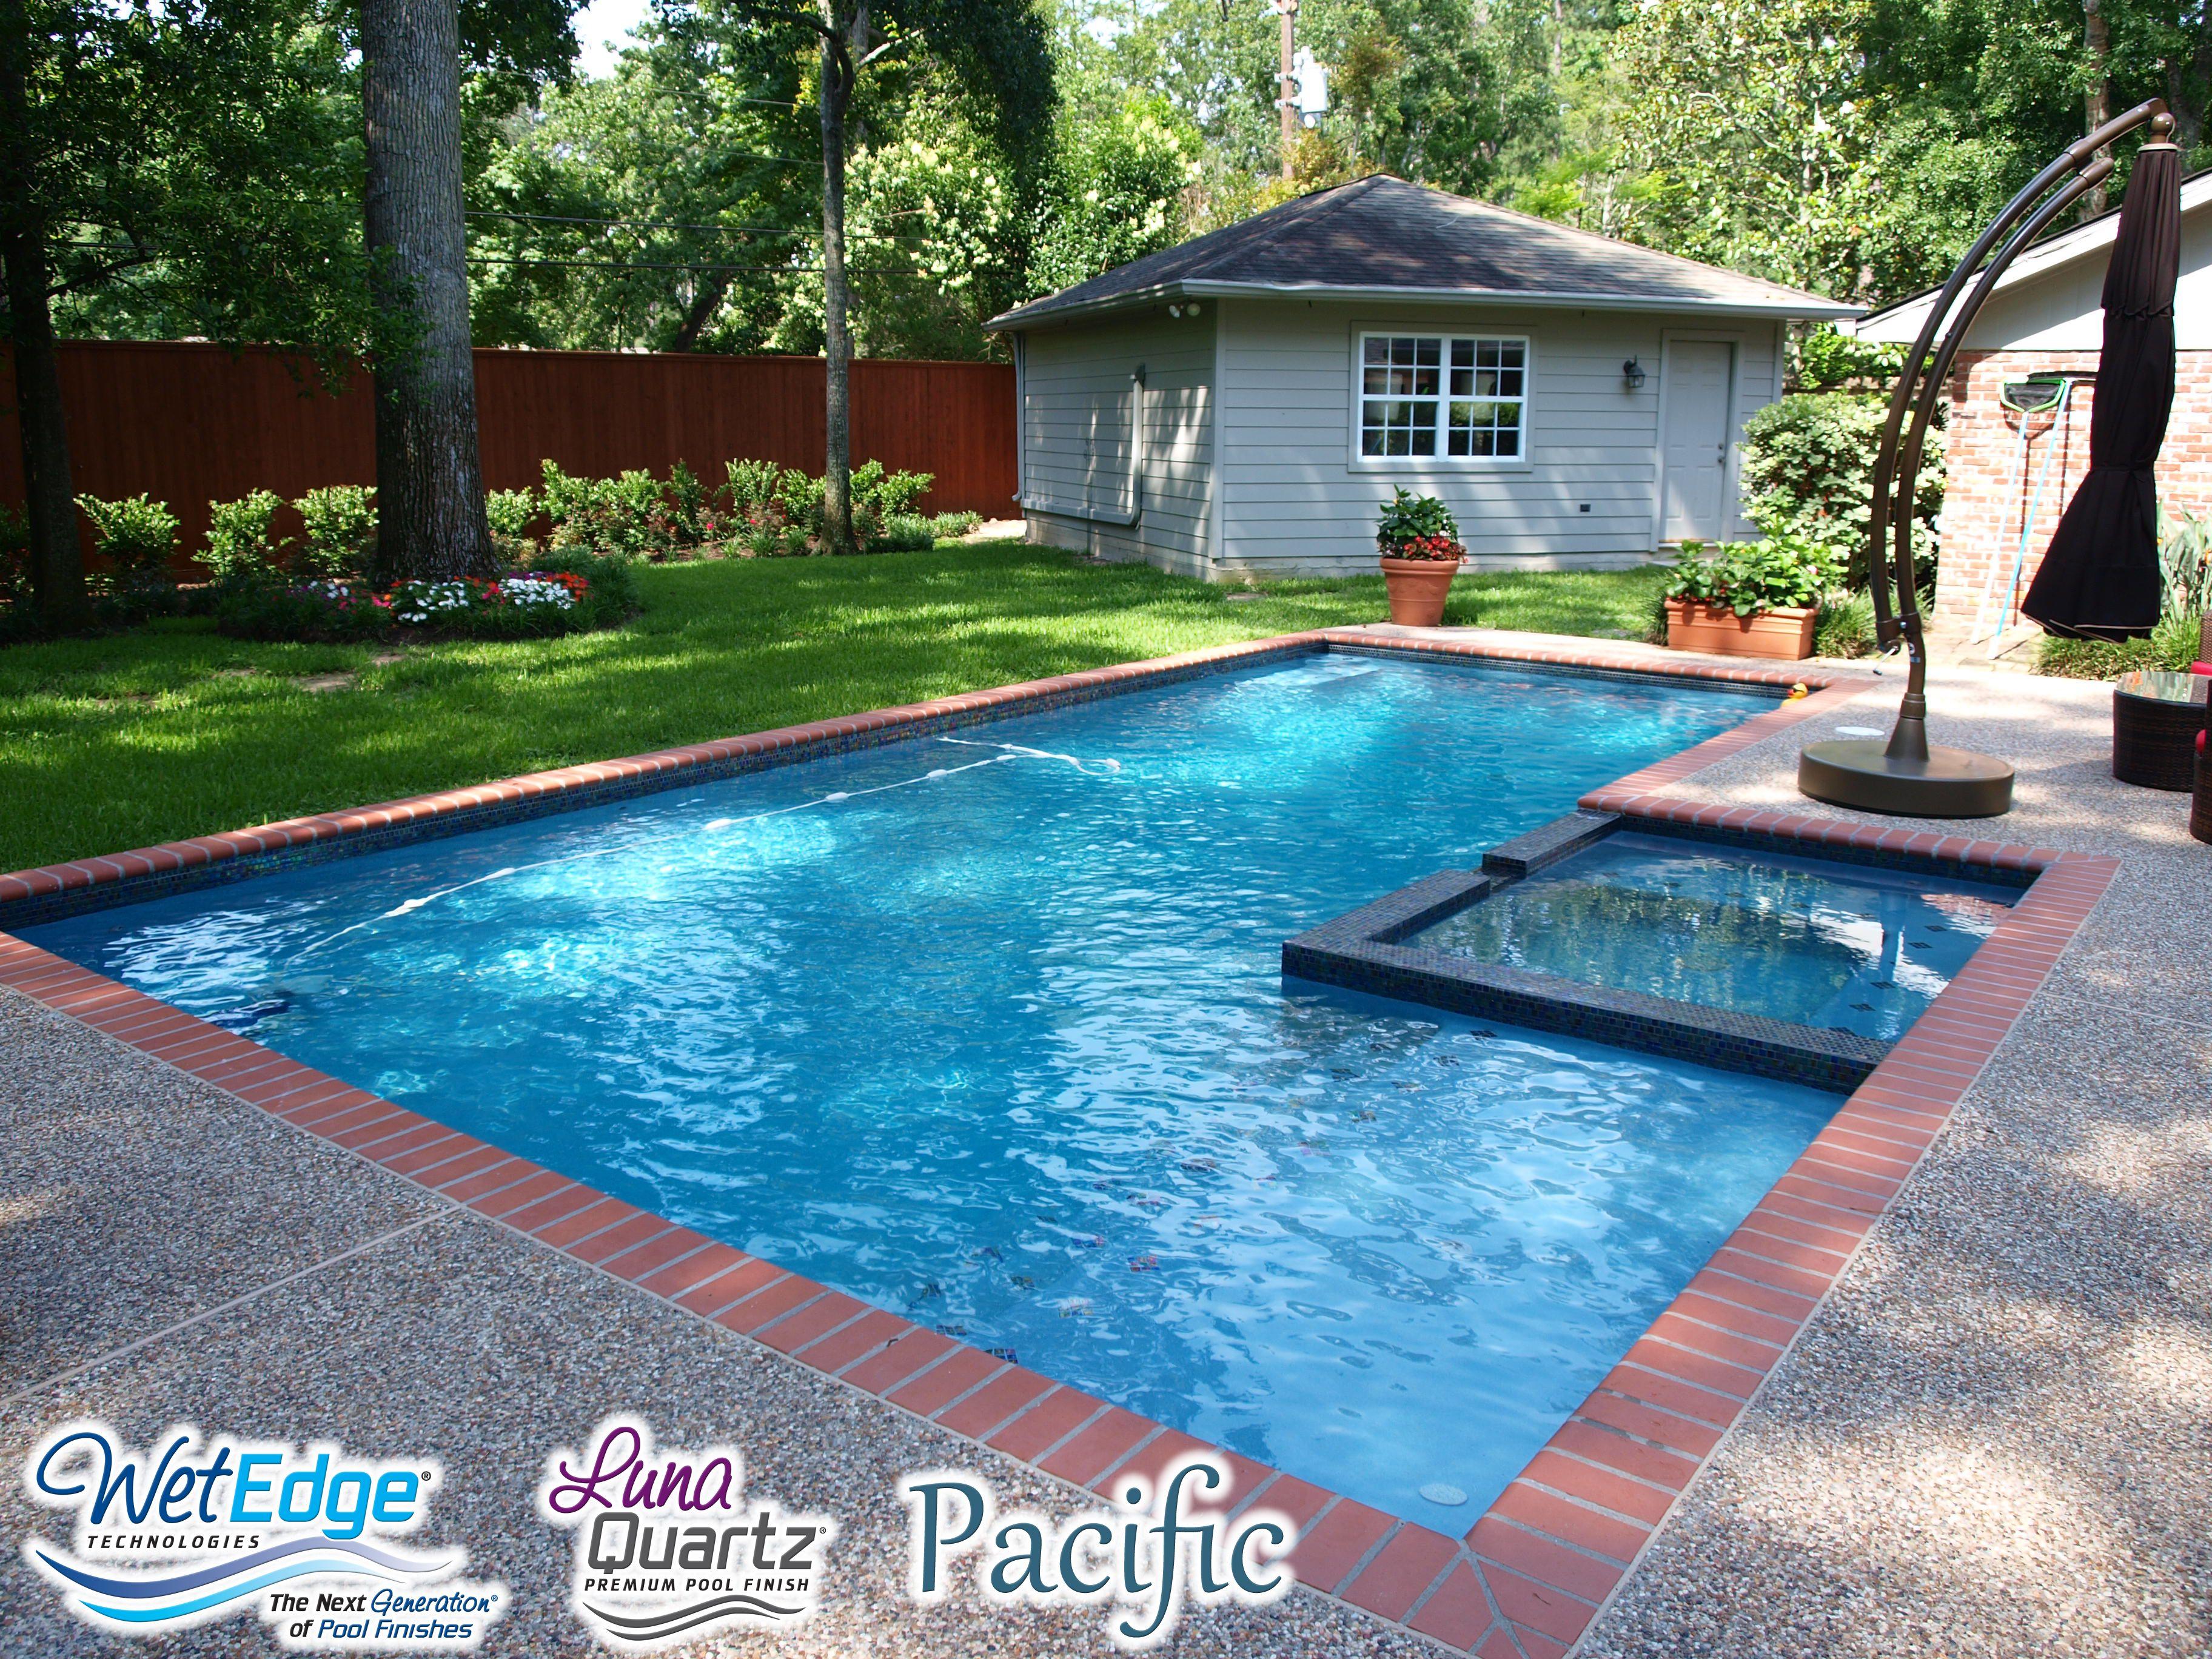 Luna Quartz Pacific Pool Colors Pool Picture Backyard